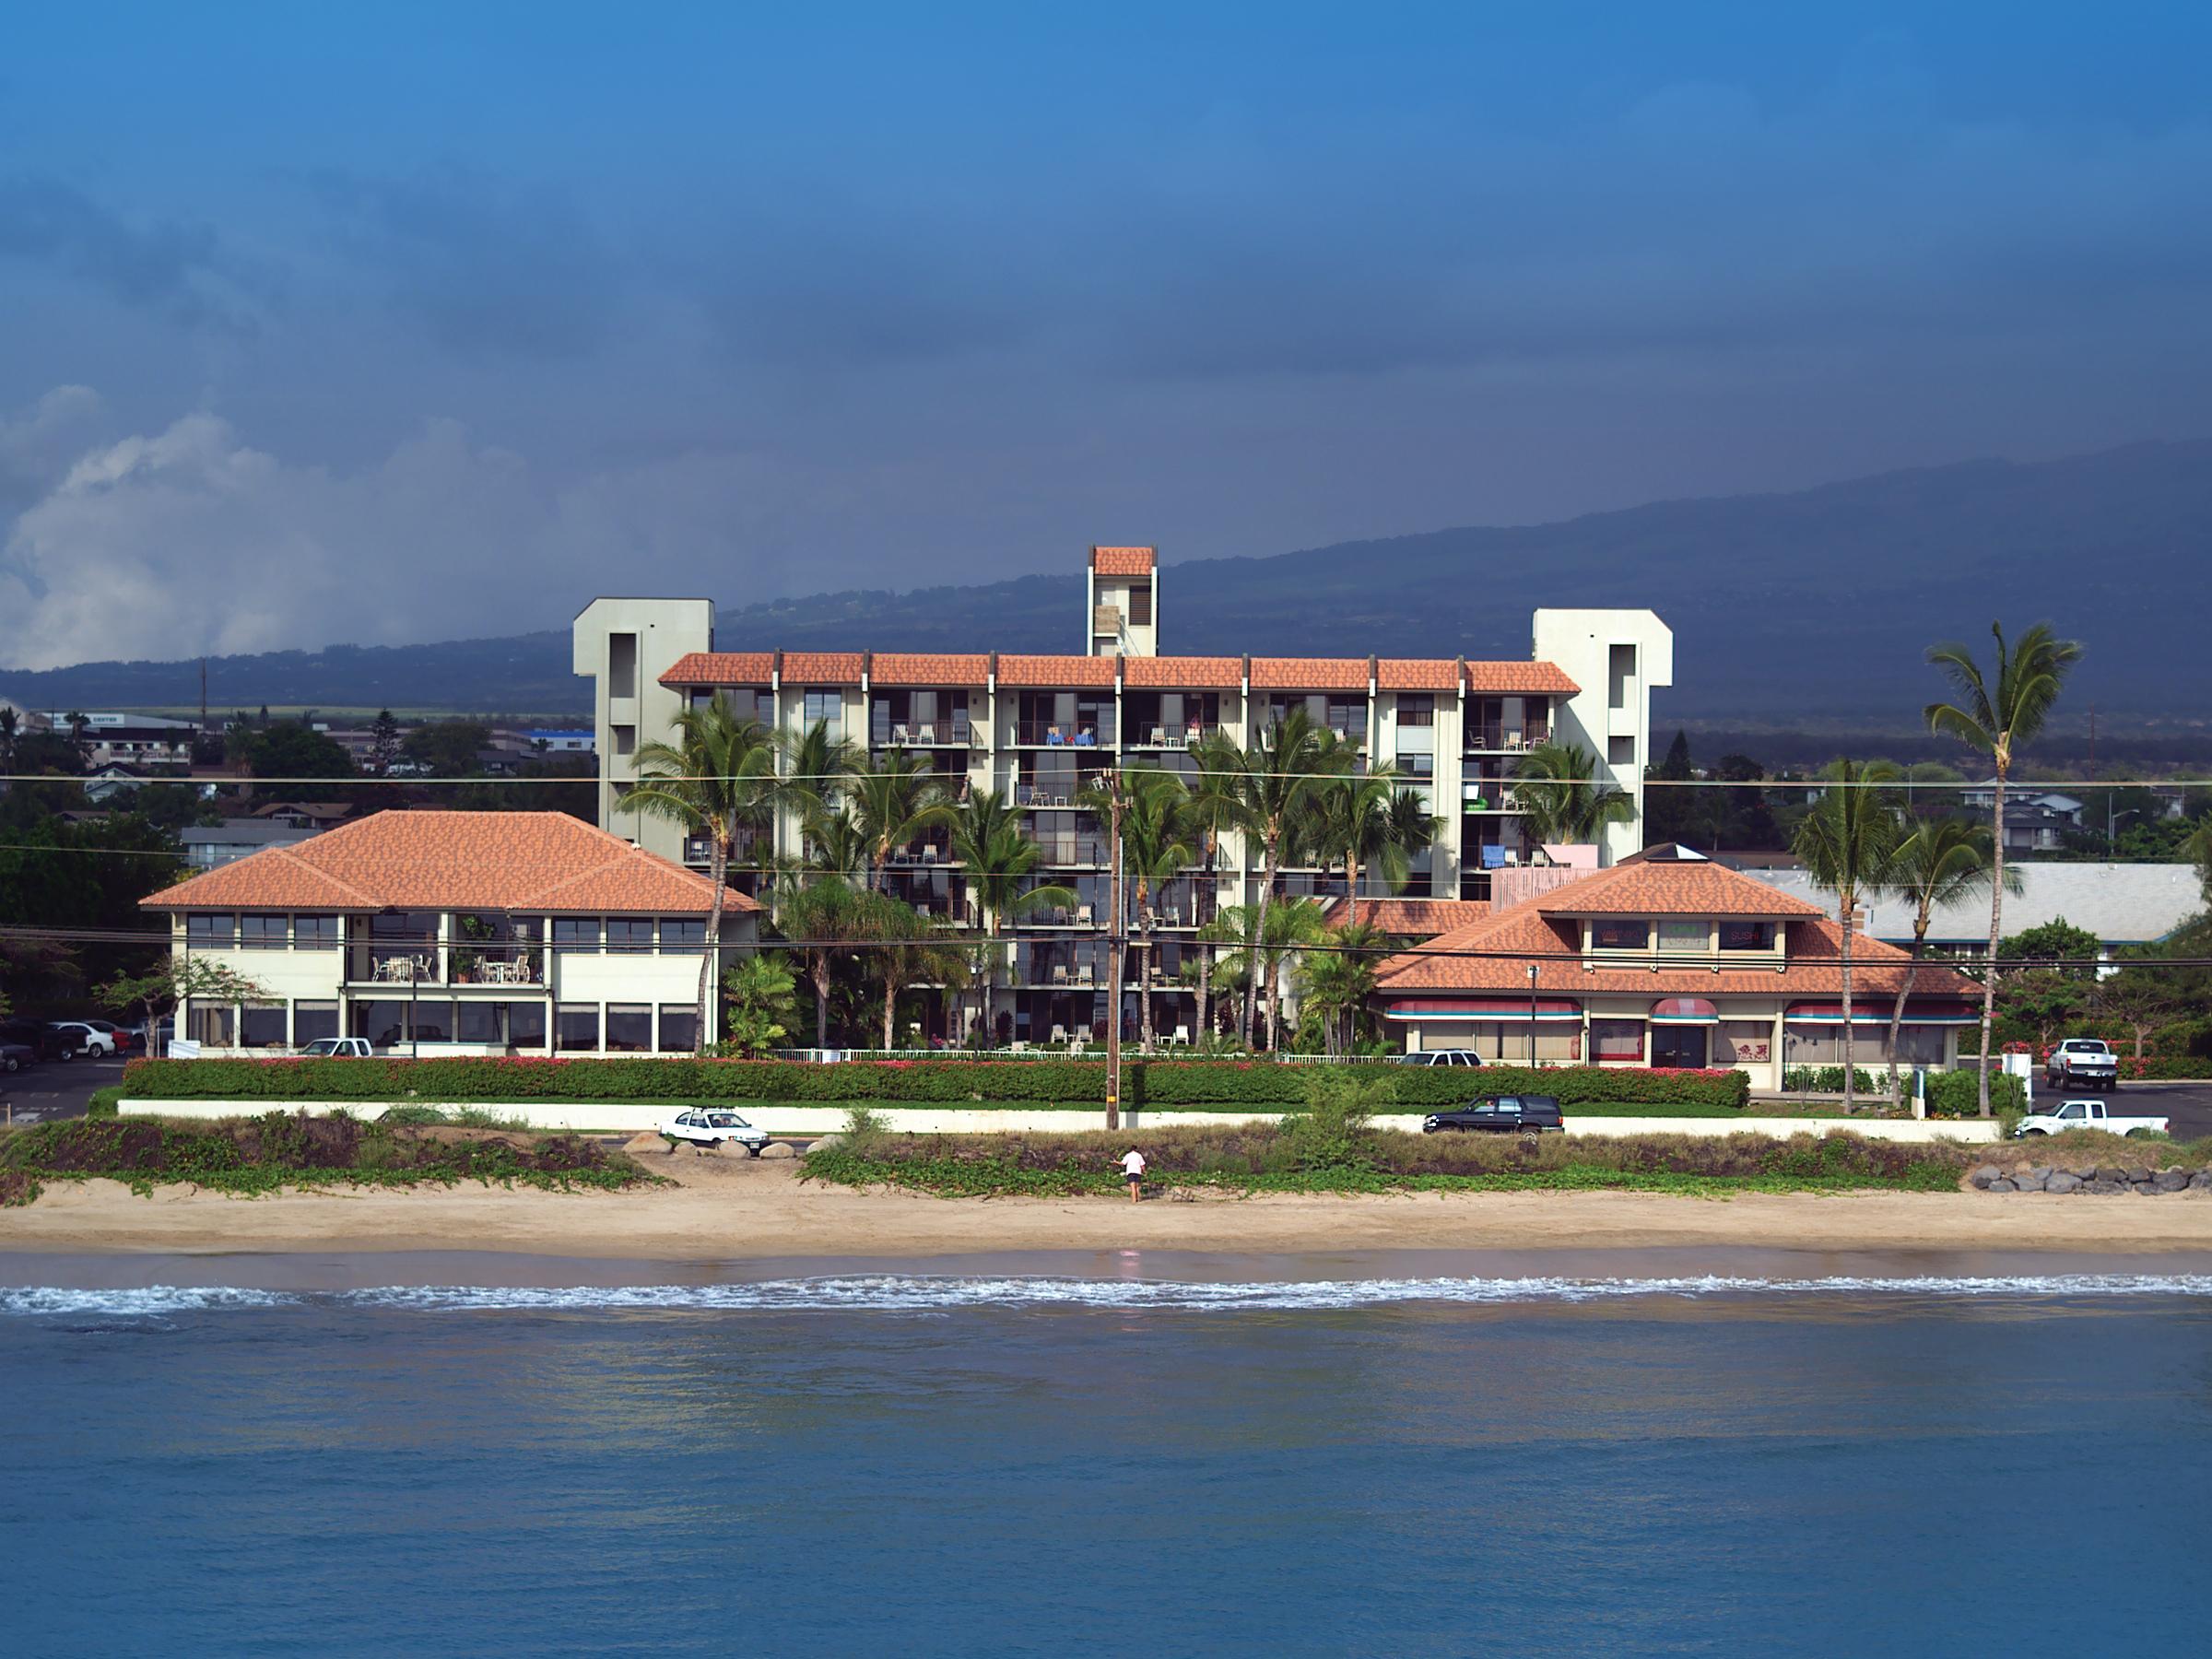 Maui Beach Vacation Club Advantage Vacation Timeshare